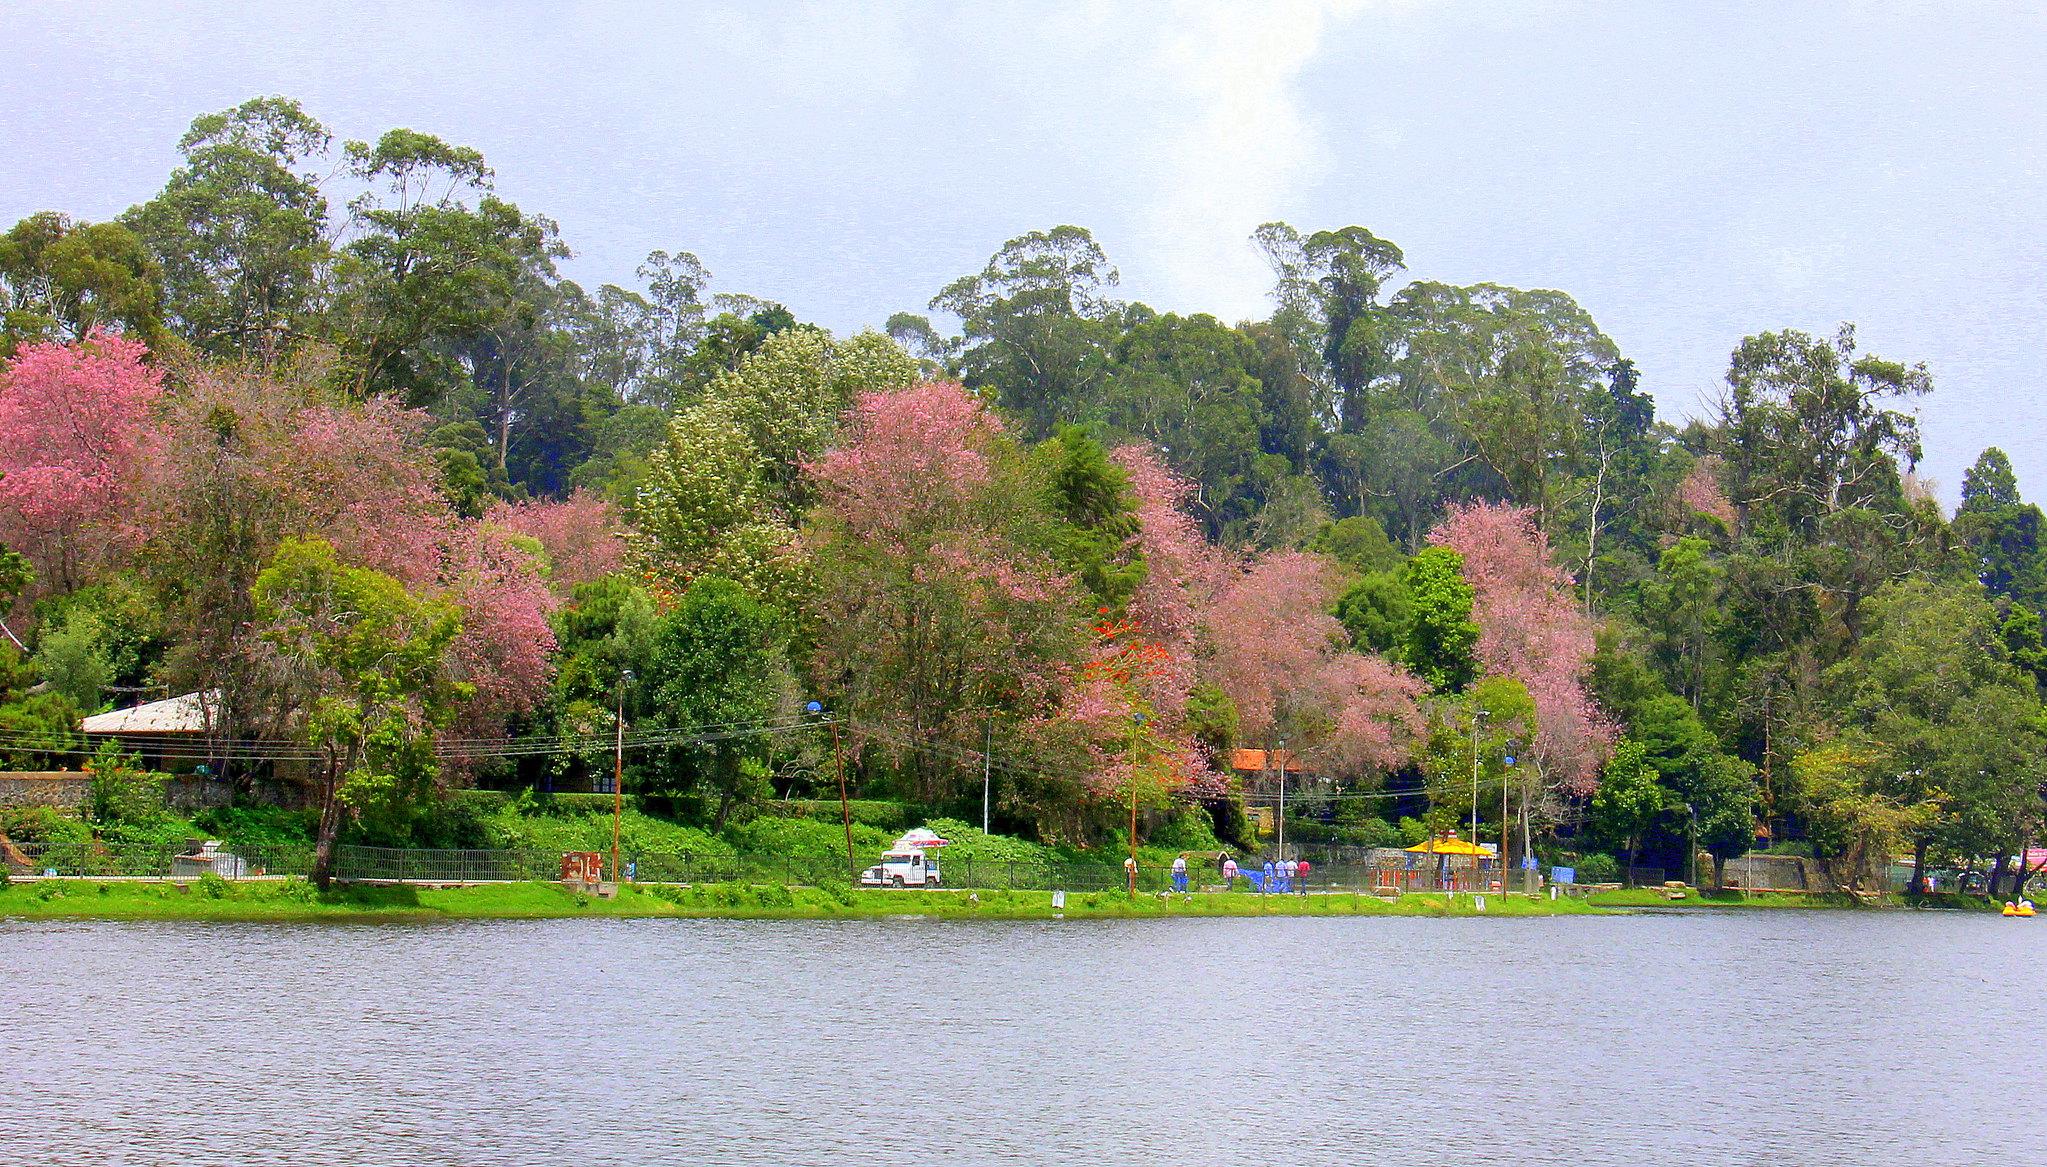 Cherry trees in bloom all around the lake in Kodaikanal